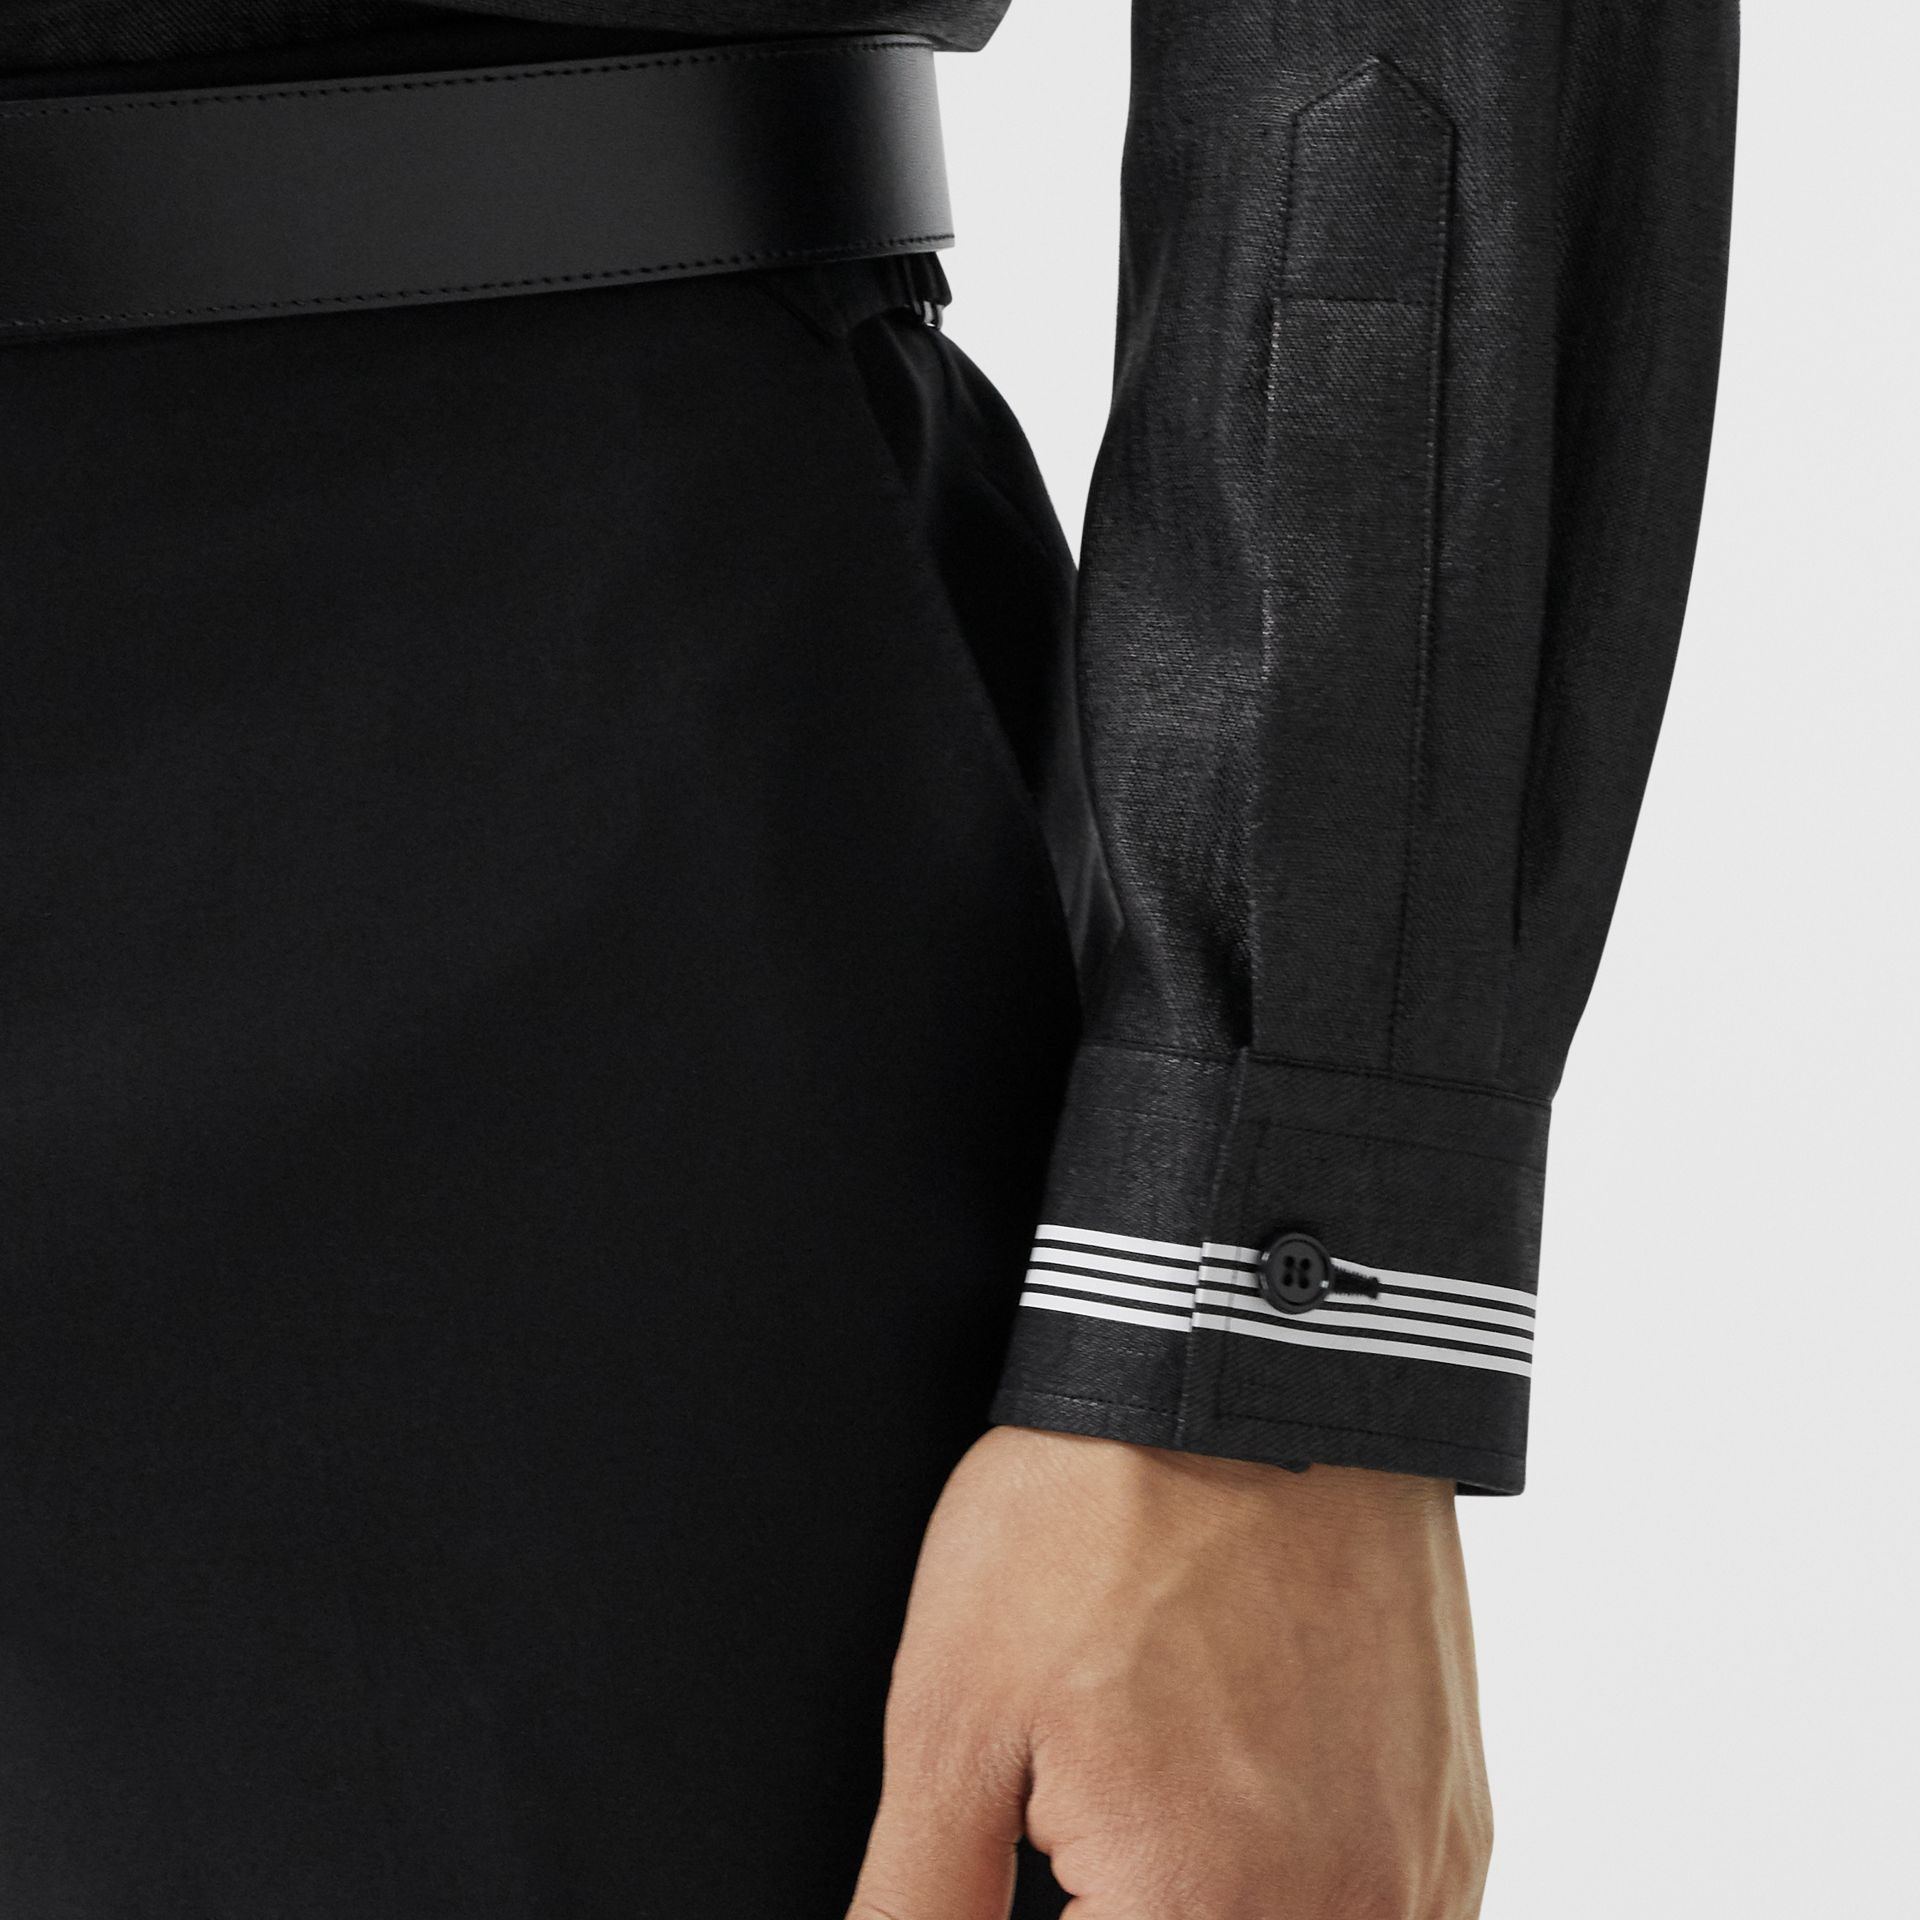 Logo Print Linen Blend Shirt in Black | Burberry - gallery image 4